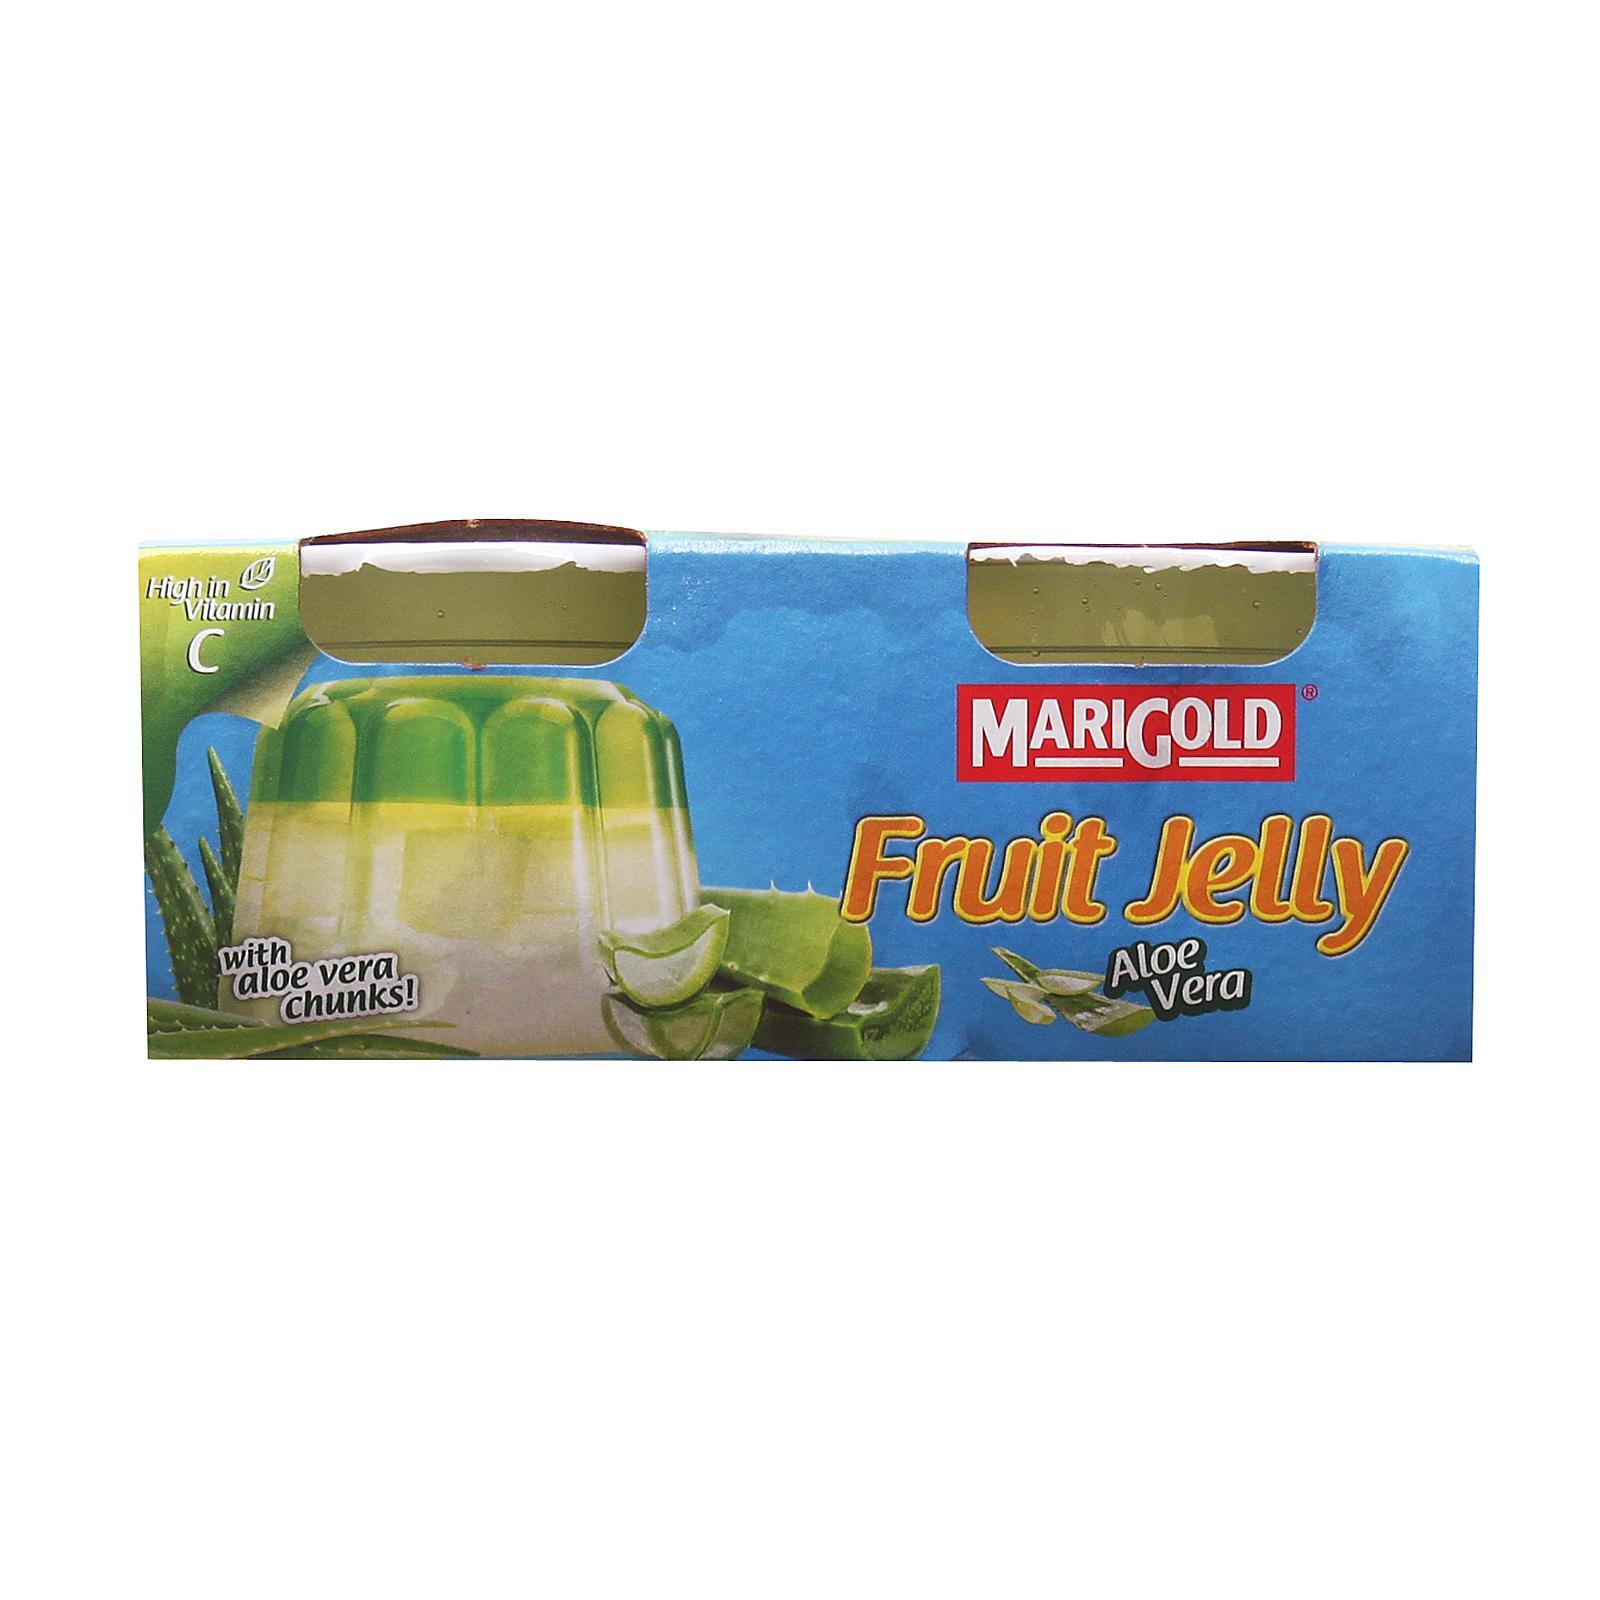 Marigold Jelly - Aloe Vera By Redmart.